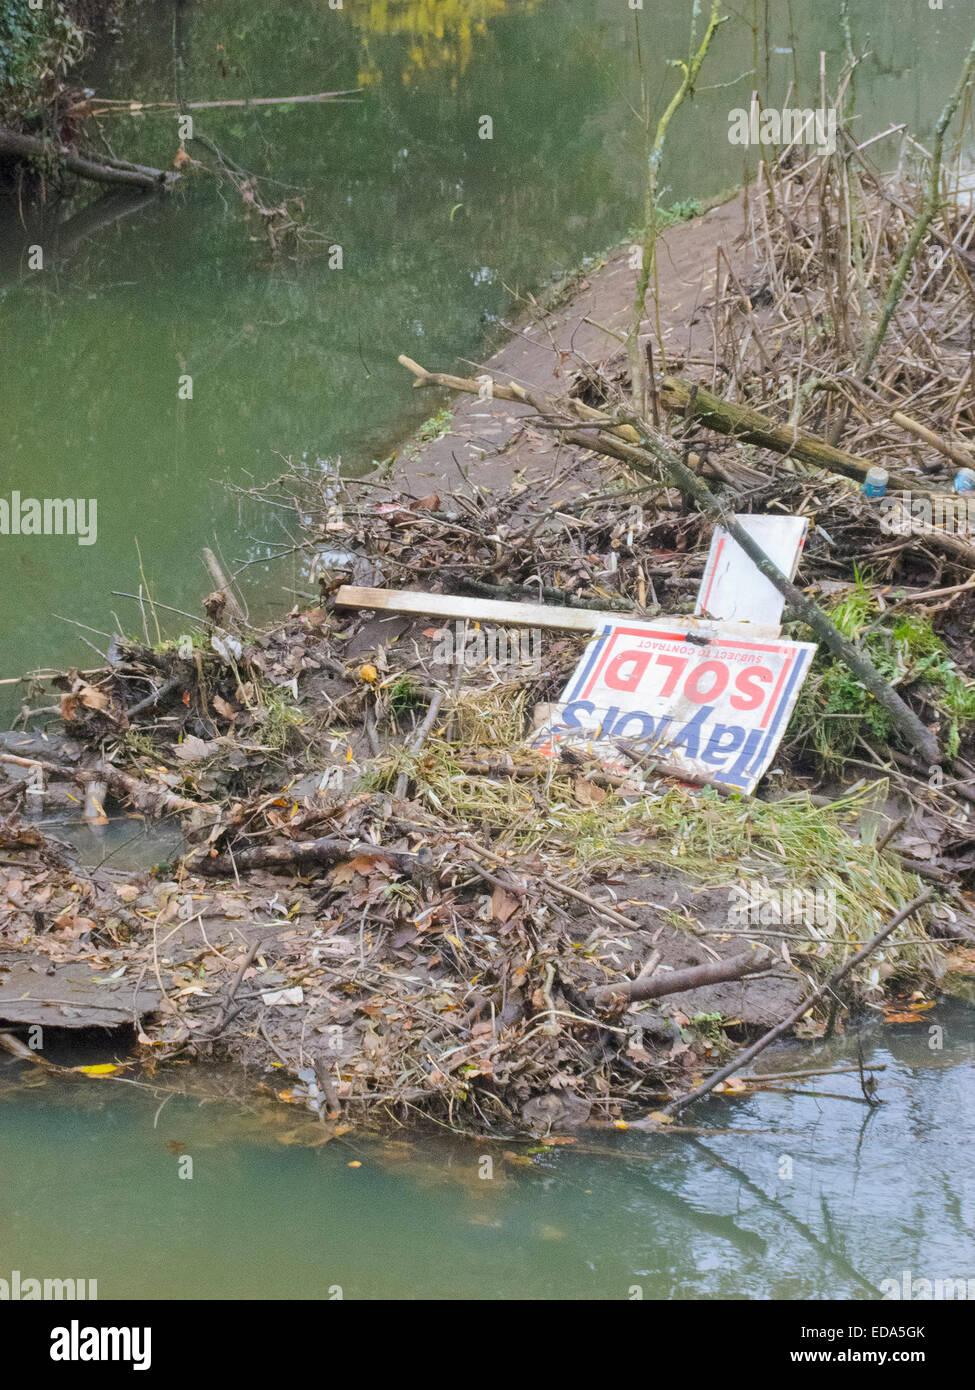 Rubbish Blocking the River Stour, Prestwood, Staffordshire, England, UK - Stock Image